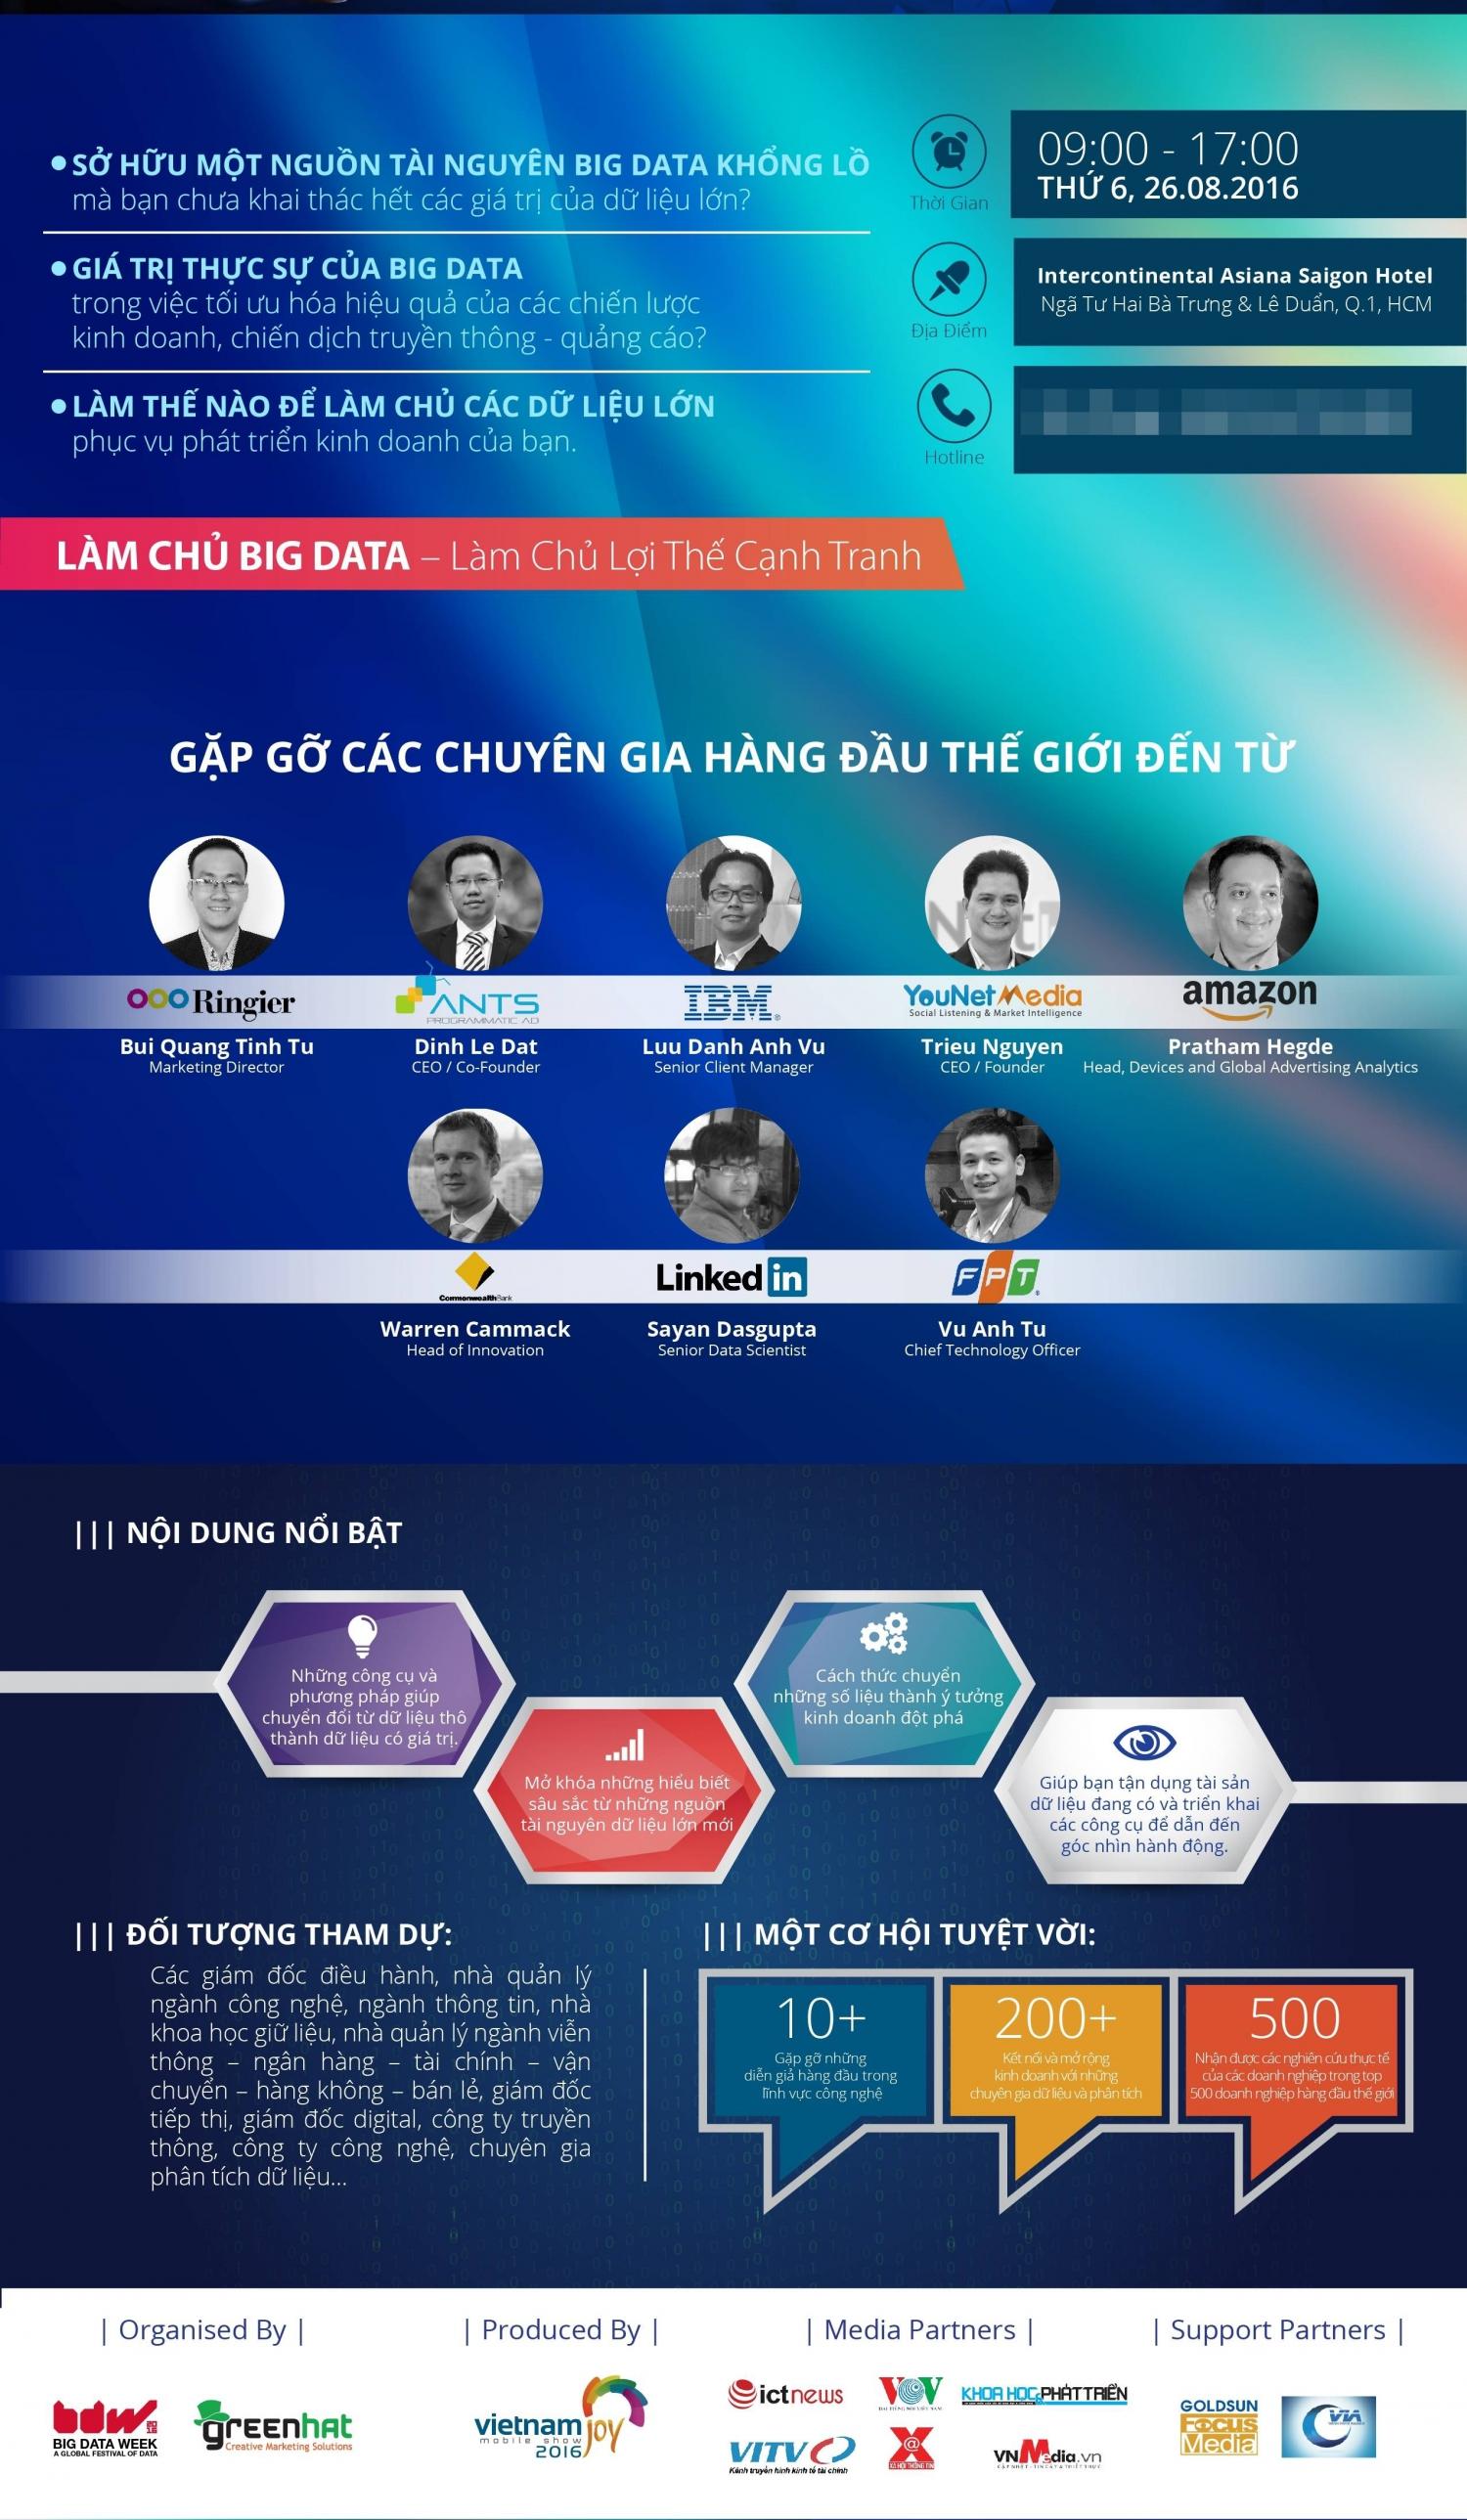 Big Data Innovation summit 2016